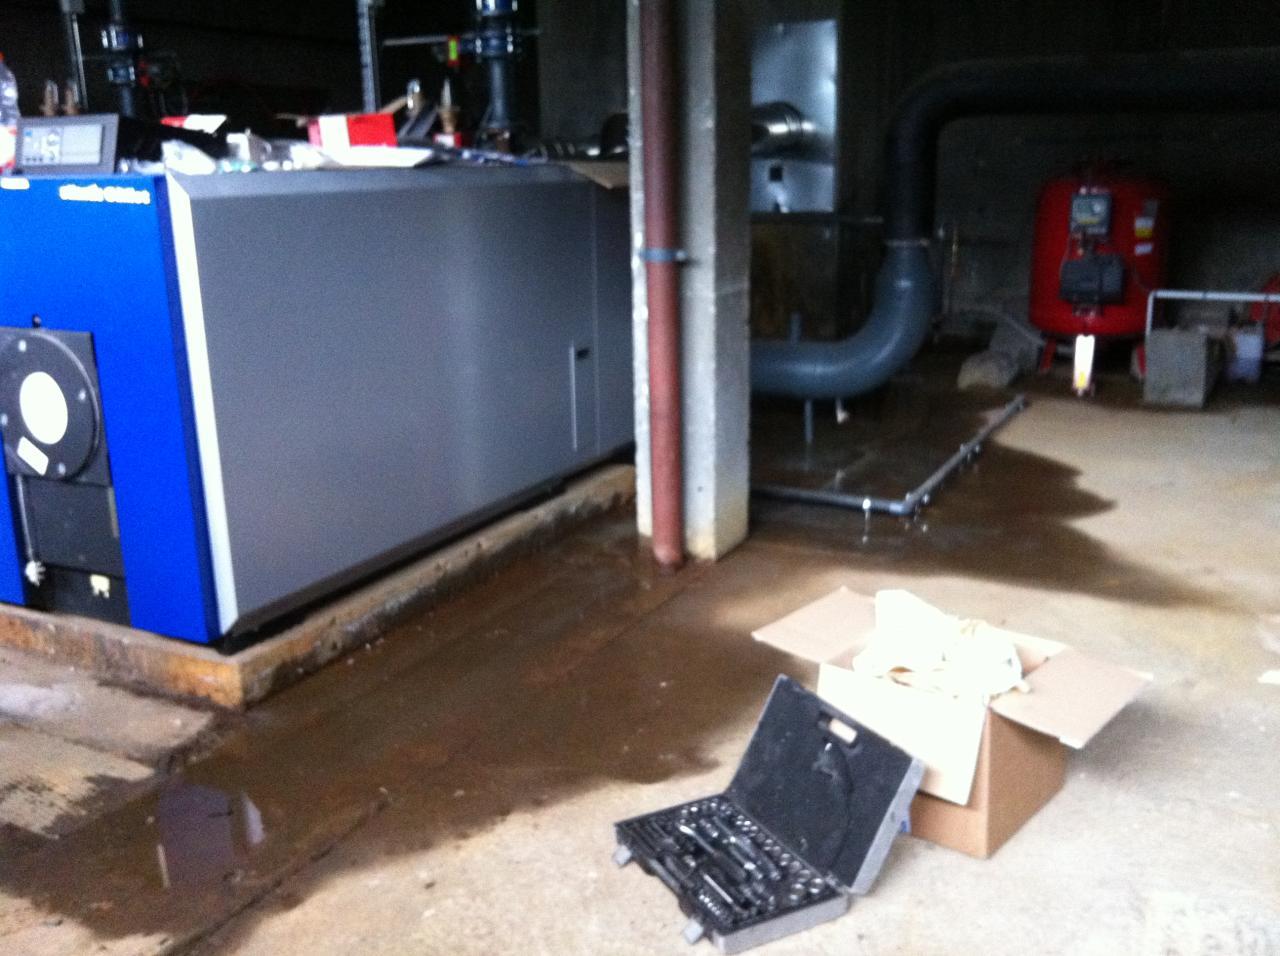 chaufferie infiltrations d'eau